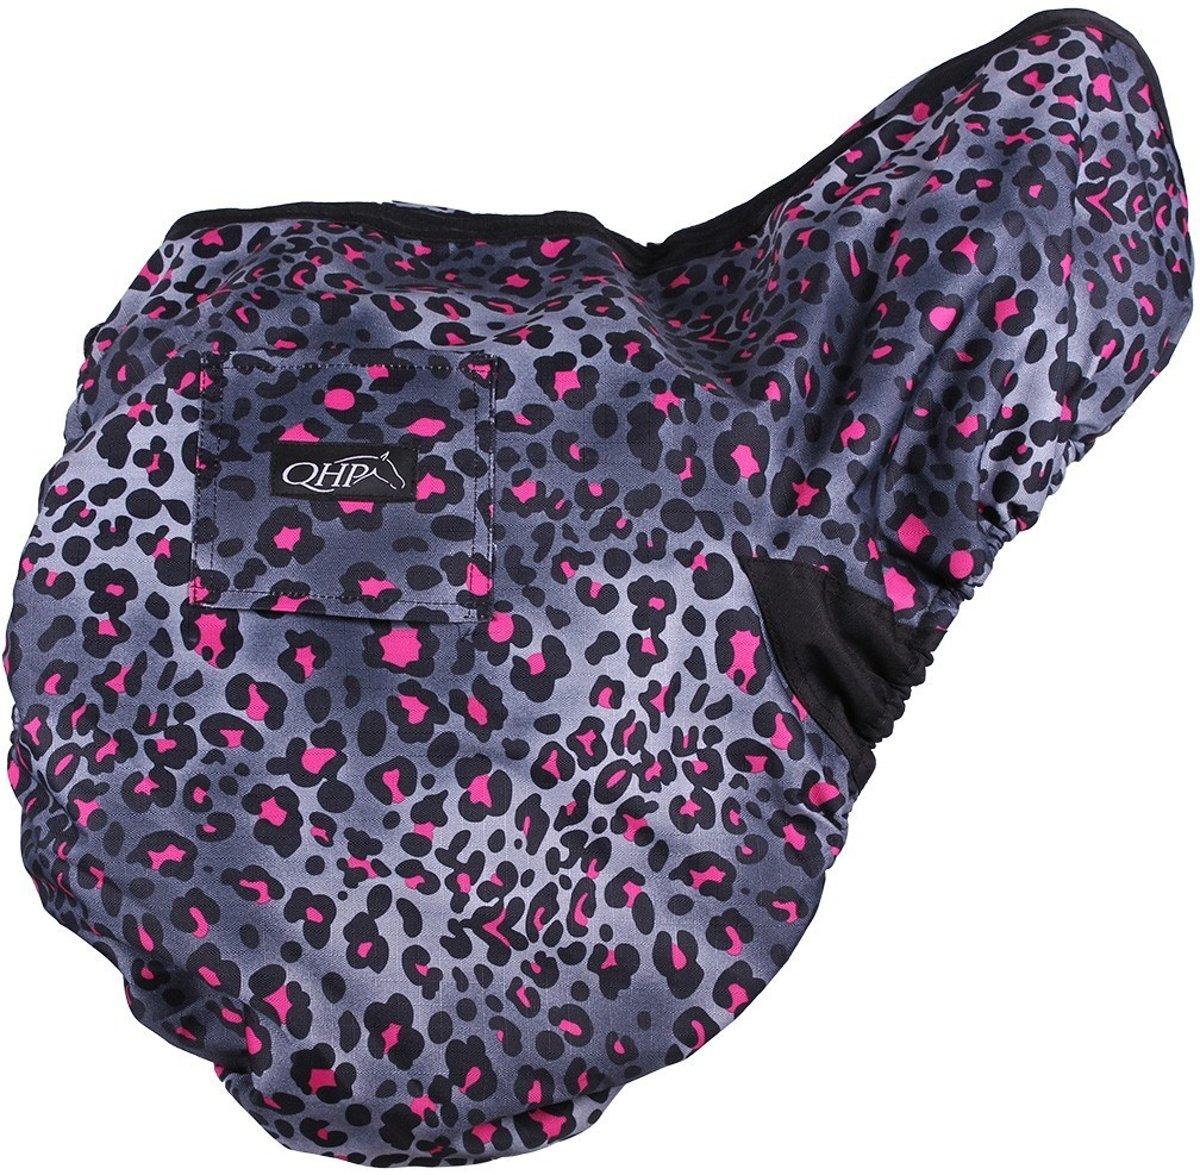 QHP Zadelhoes collection Pink Leopard kopen